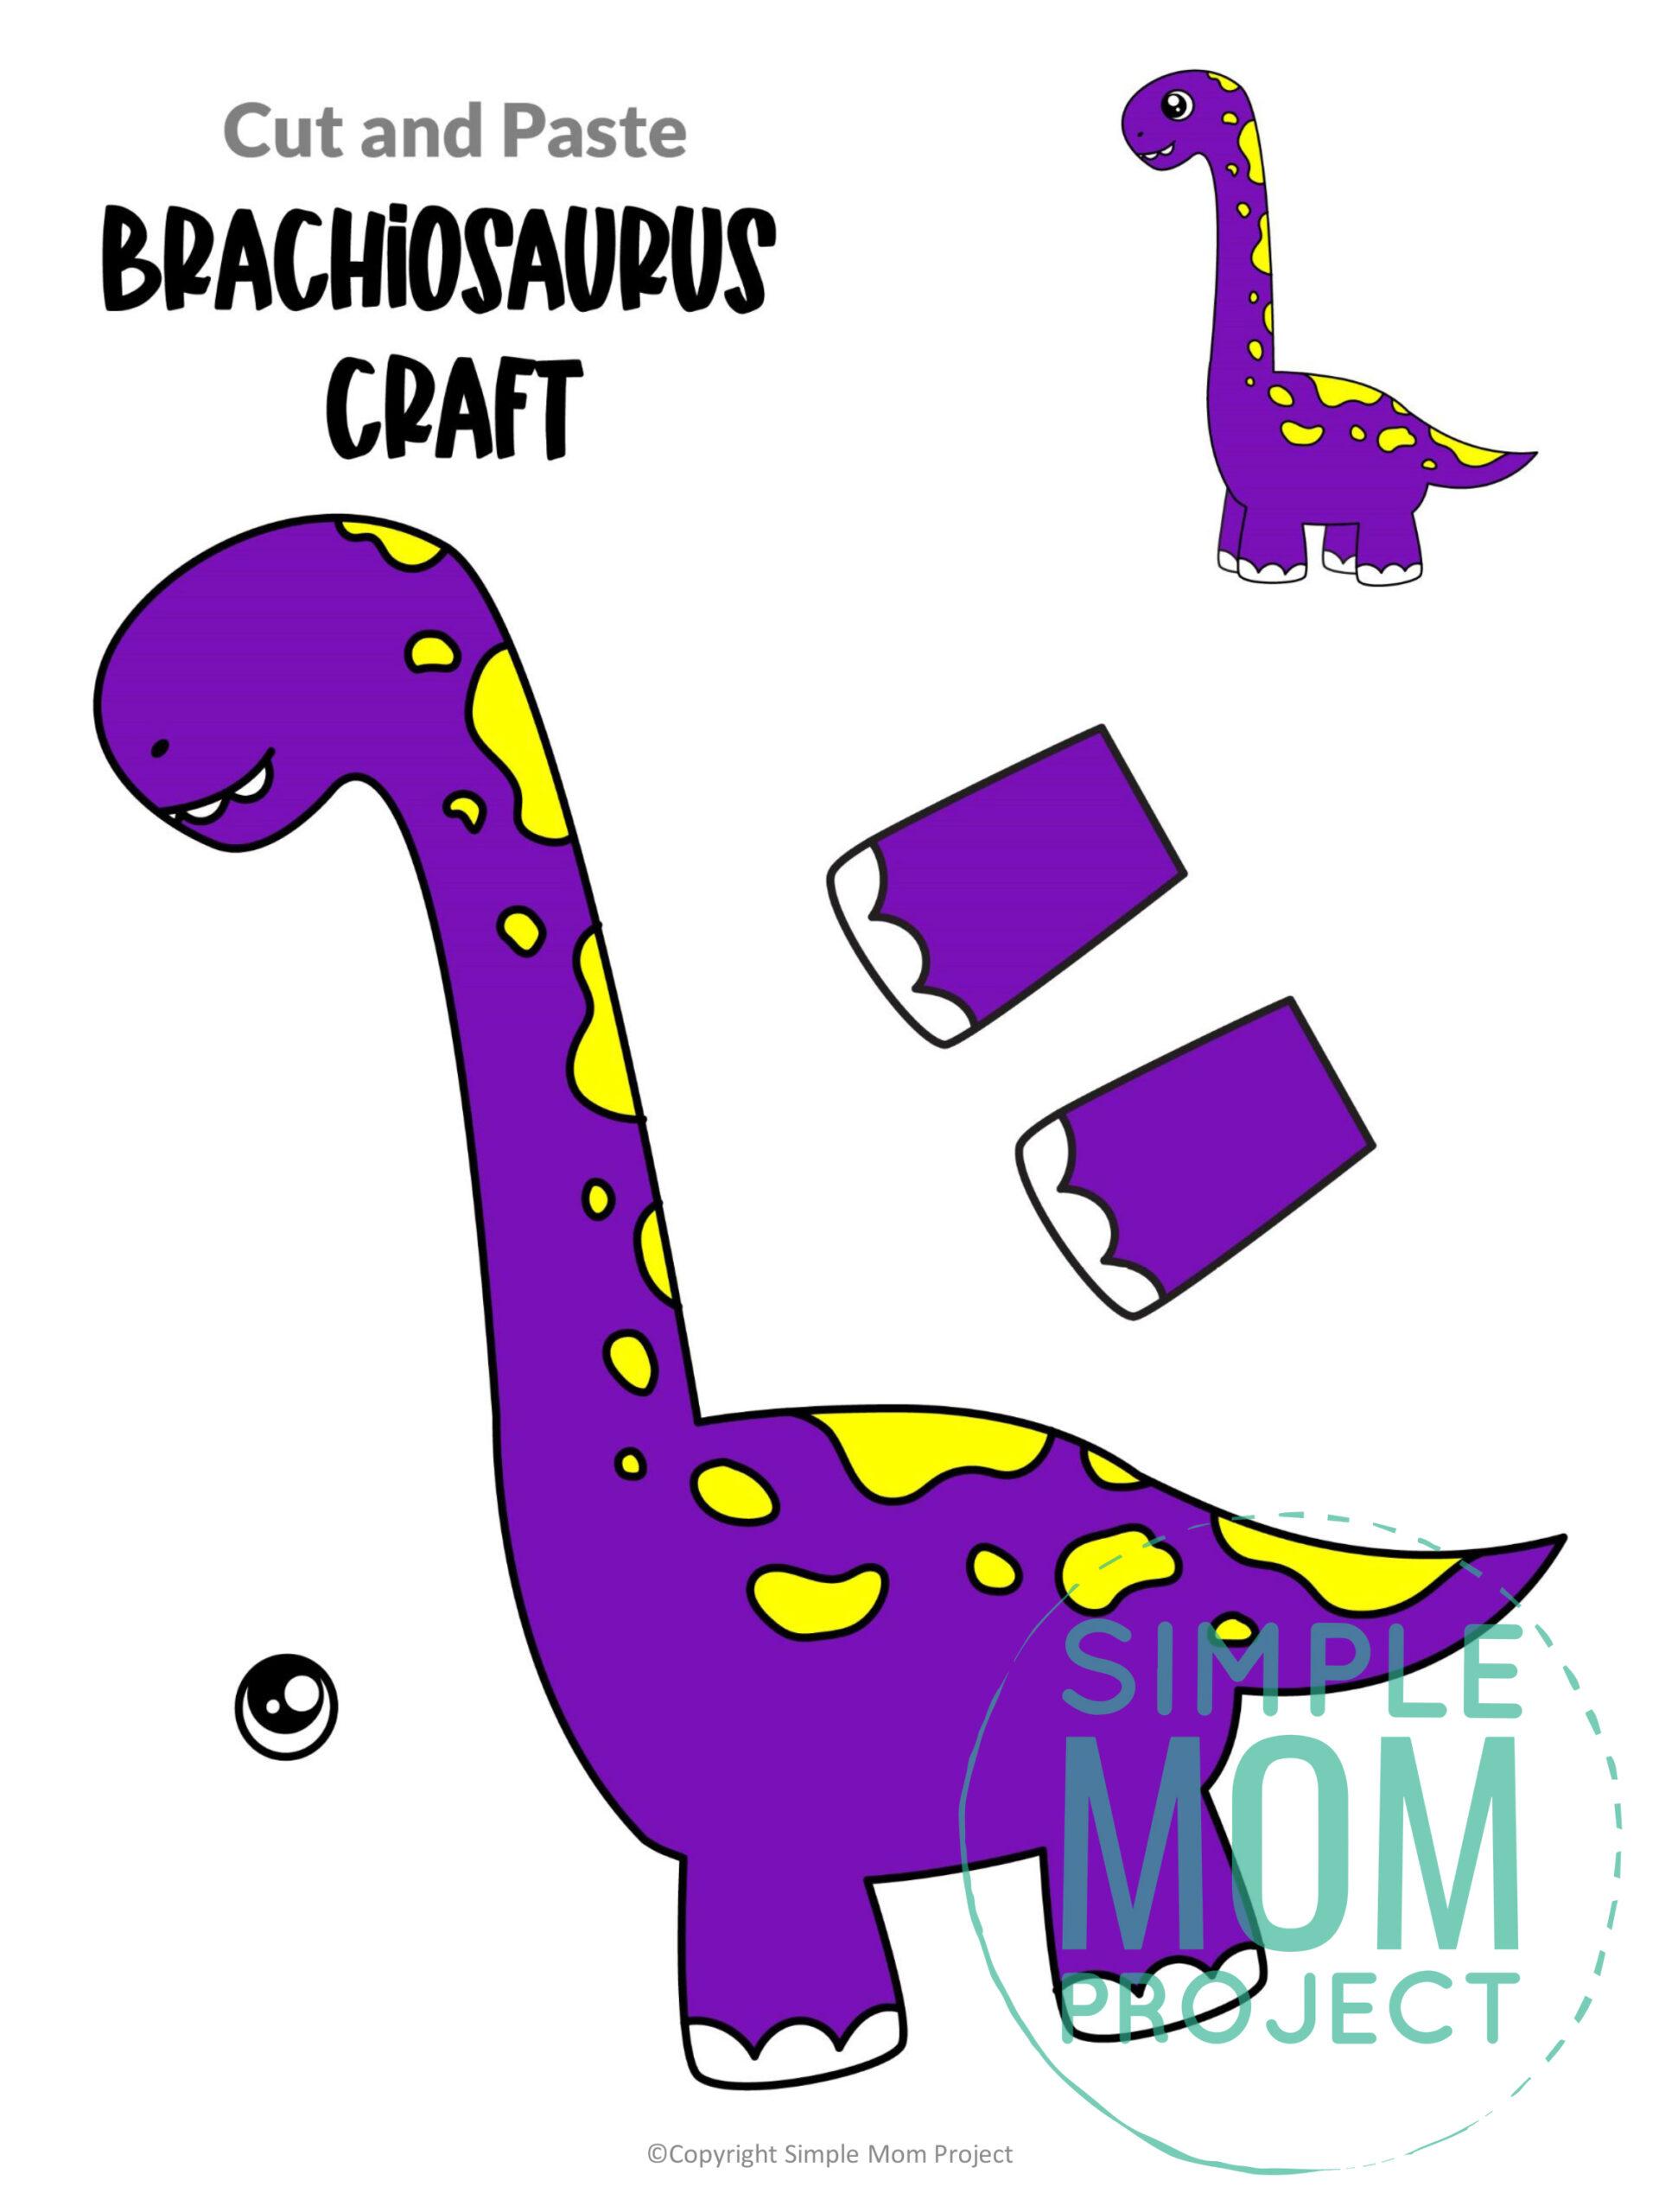 Printable Brachiosaurus Dinosaur Craft for Preschoolers, toddlers and kindergartners